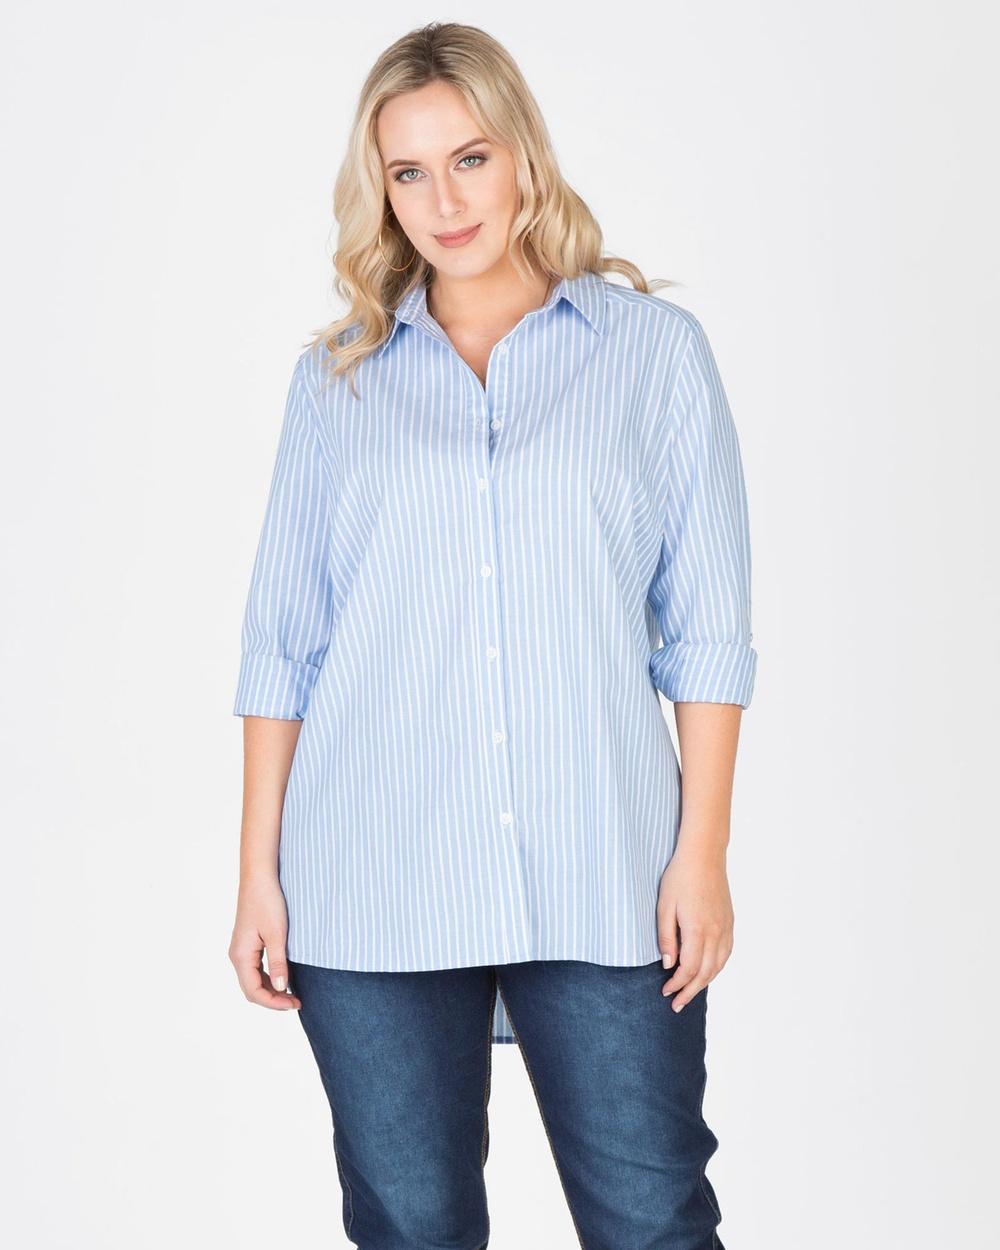 Love Your Wardrobe Hamptons Stripe Shirt Tops Blue / White Stripe Hamptons Stripe Shirt